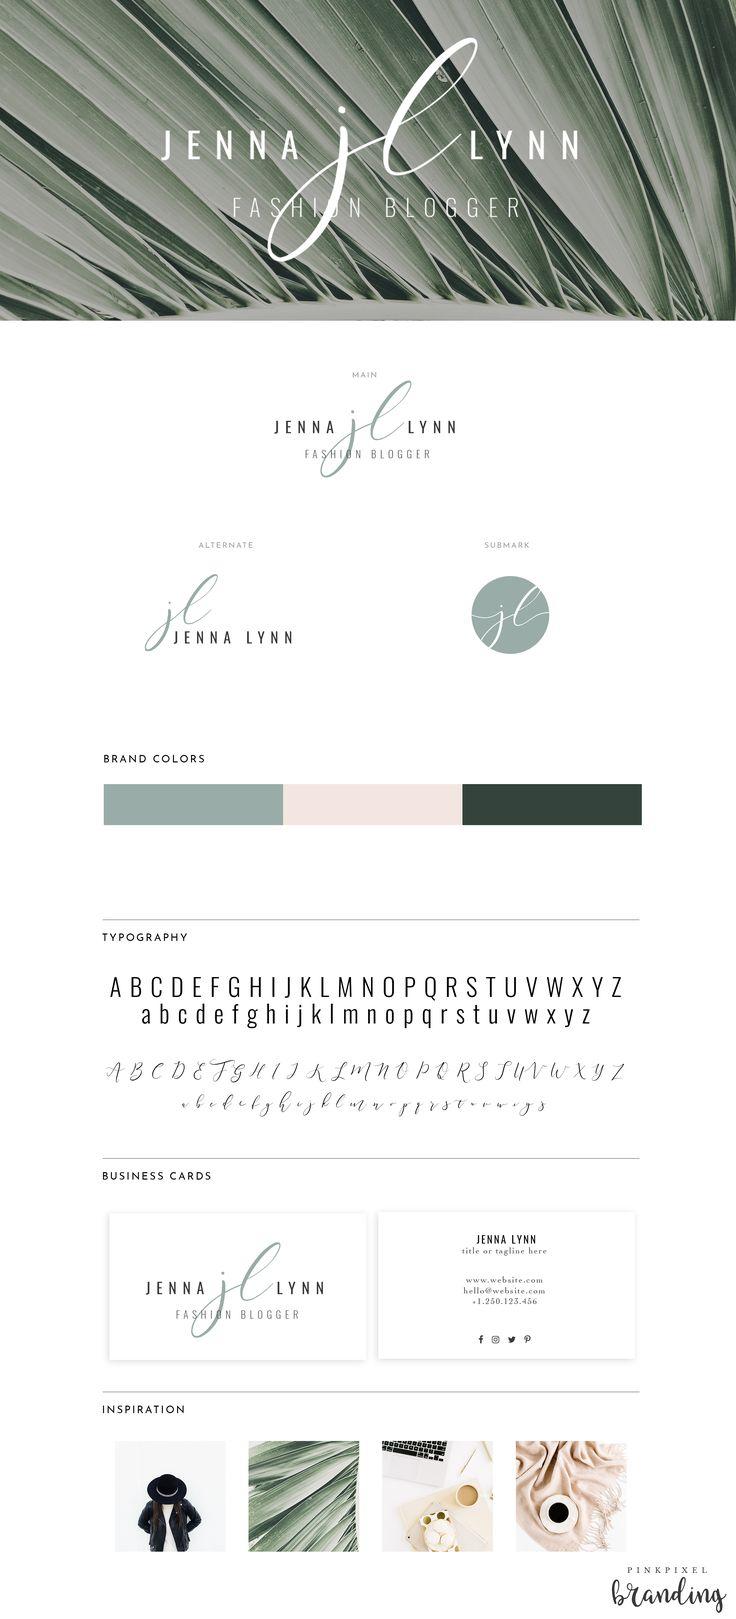 Such a cute minimalist logo. Perfect for bloggers or photographers! #logodesign #bloglogo #branding (scheduled via http://www.tailwindapp.com?utm_source=pinterest&utm_medium=twpin)